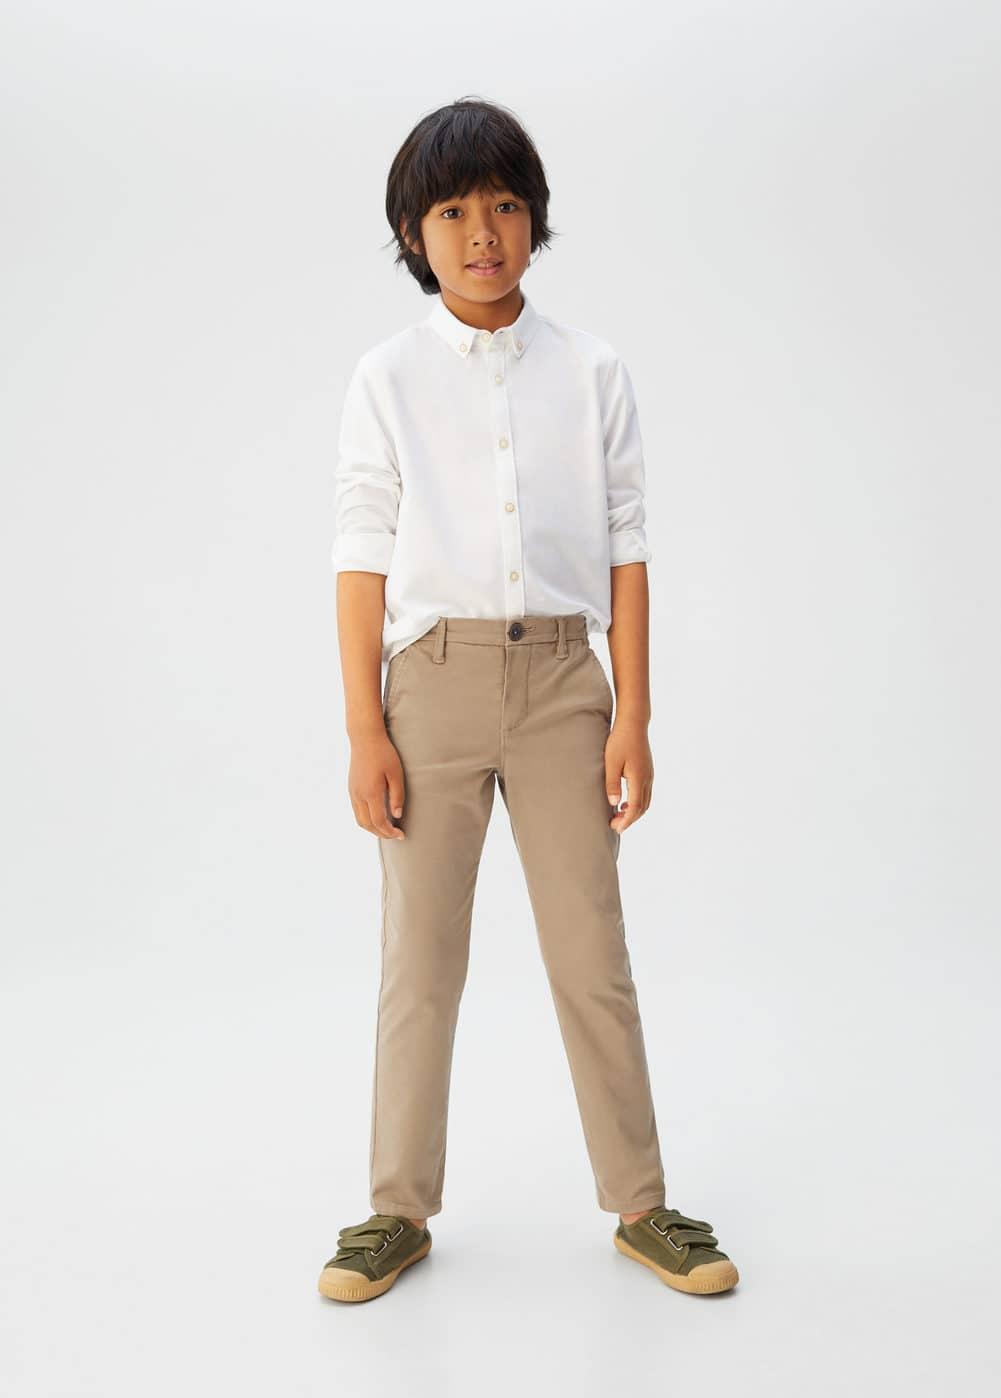 o-piccolo5:pantalon chino algodon